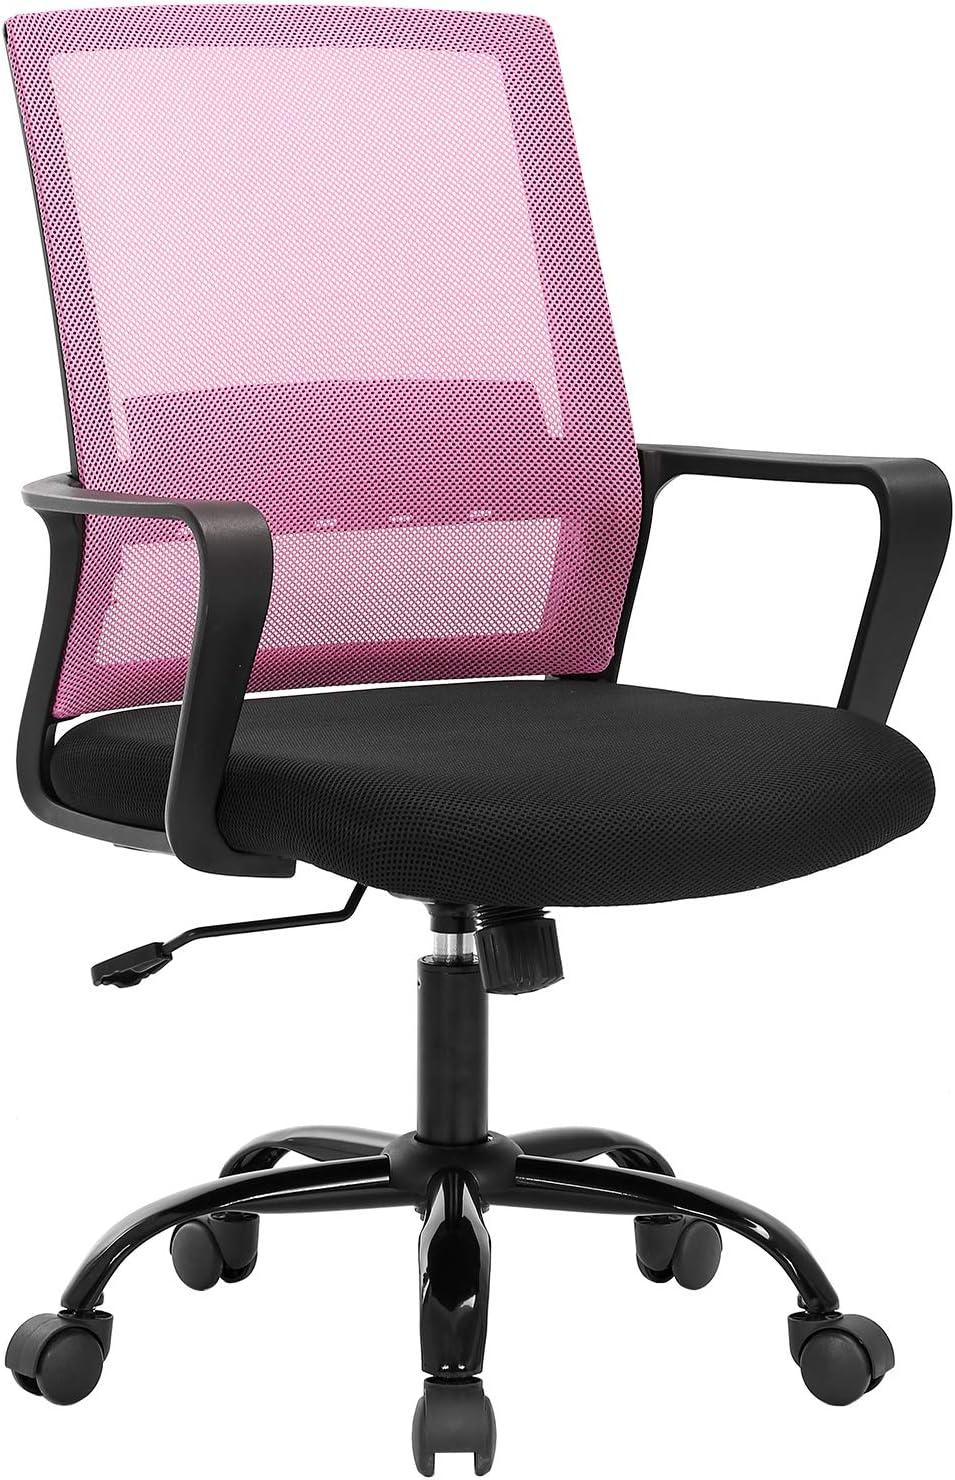 Desk Chair Mesh Office Chair Ergonomic Computer Chair Executive Lumbar Support Adjustable Stool Rolling Swivel Chair,Pink